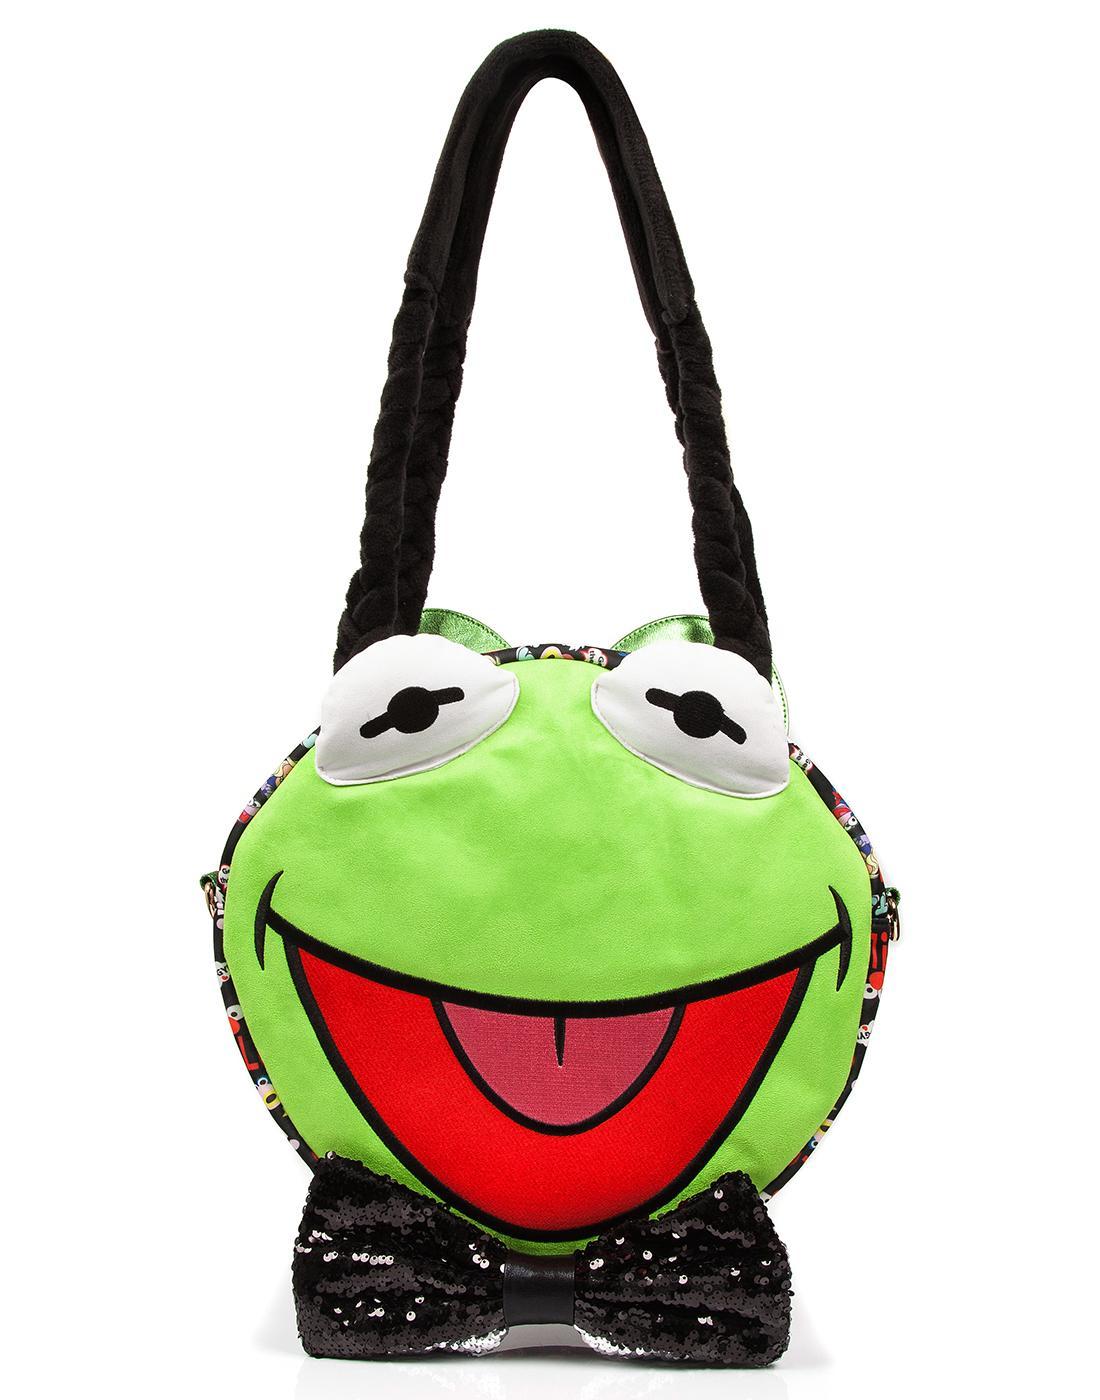 Hip Hop Happy IRREGULAR CHOICE MUPPETS Kermit Bag